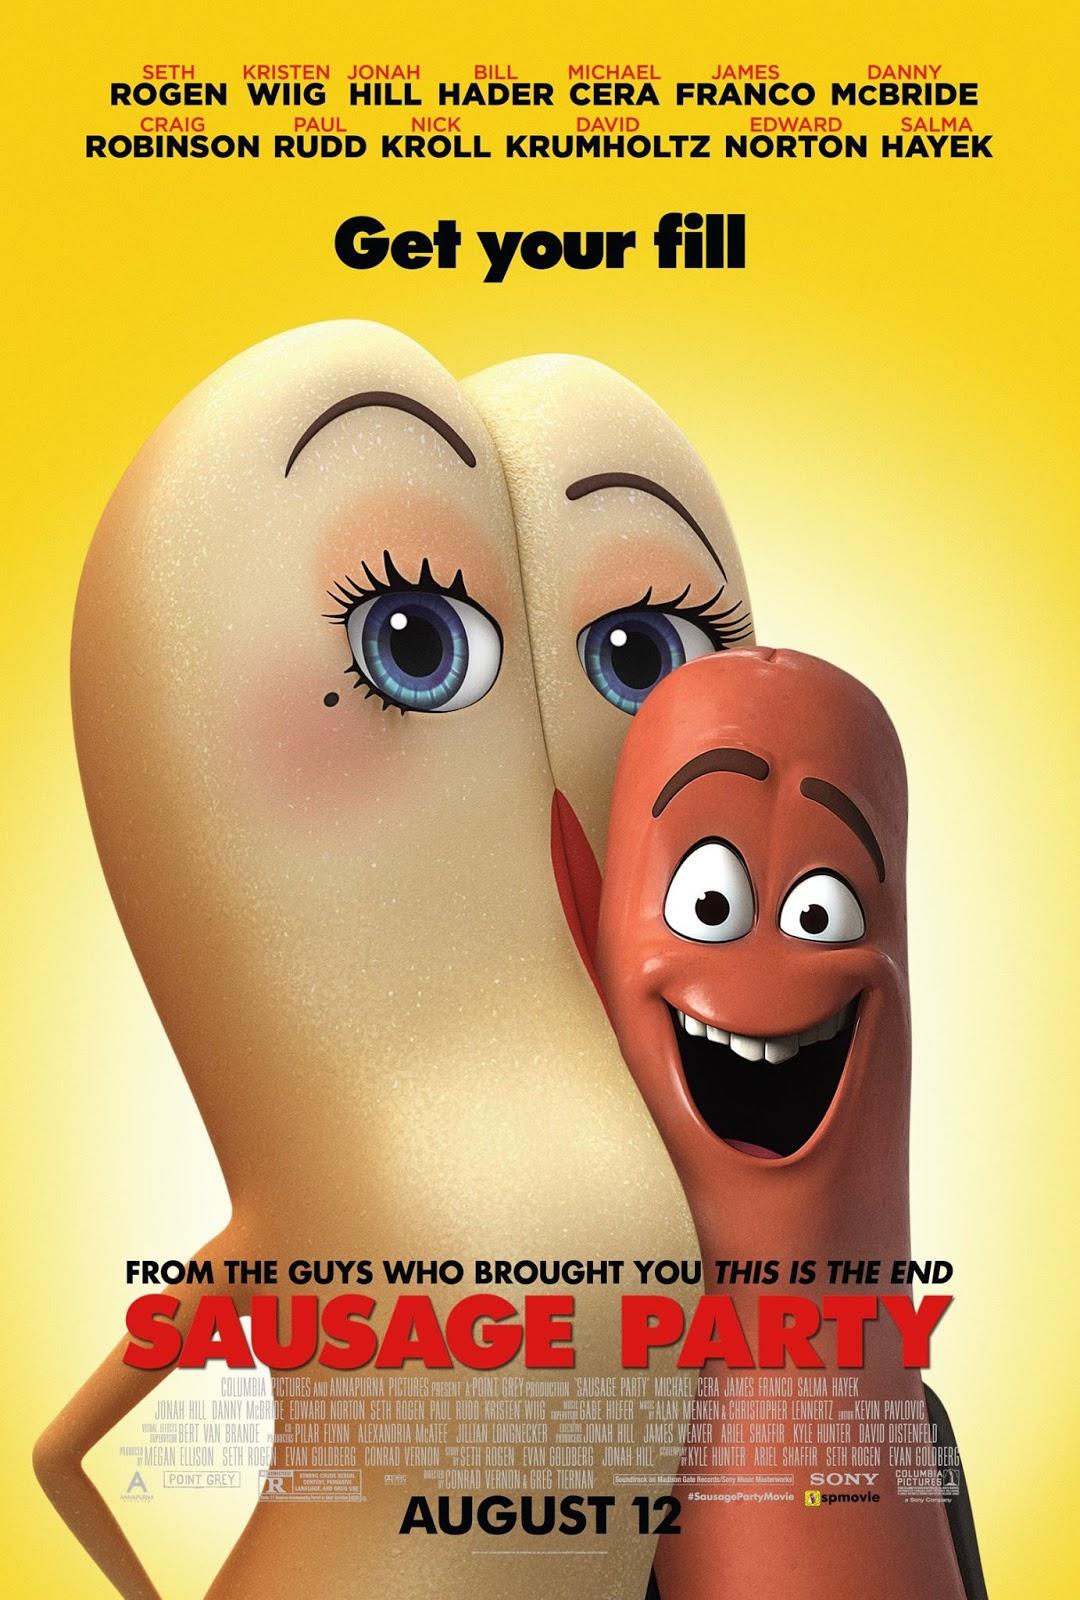 BDVR: Sausage Party